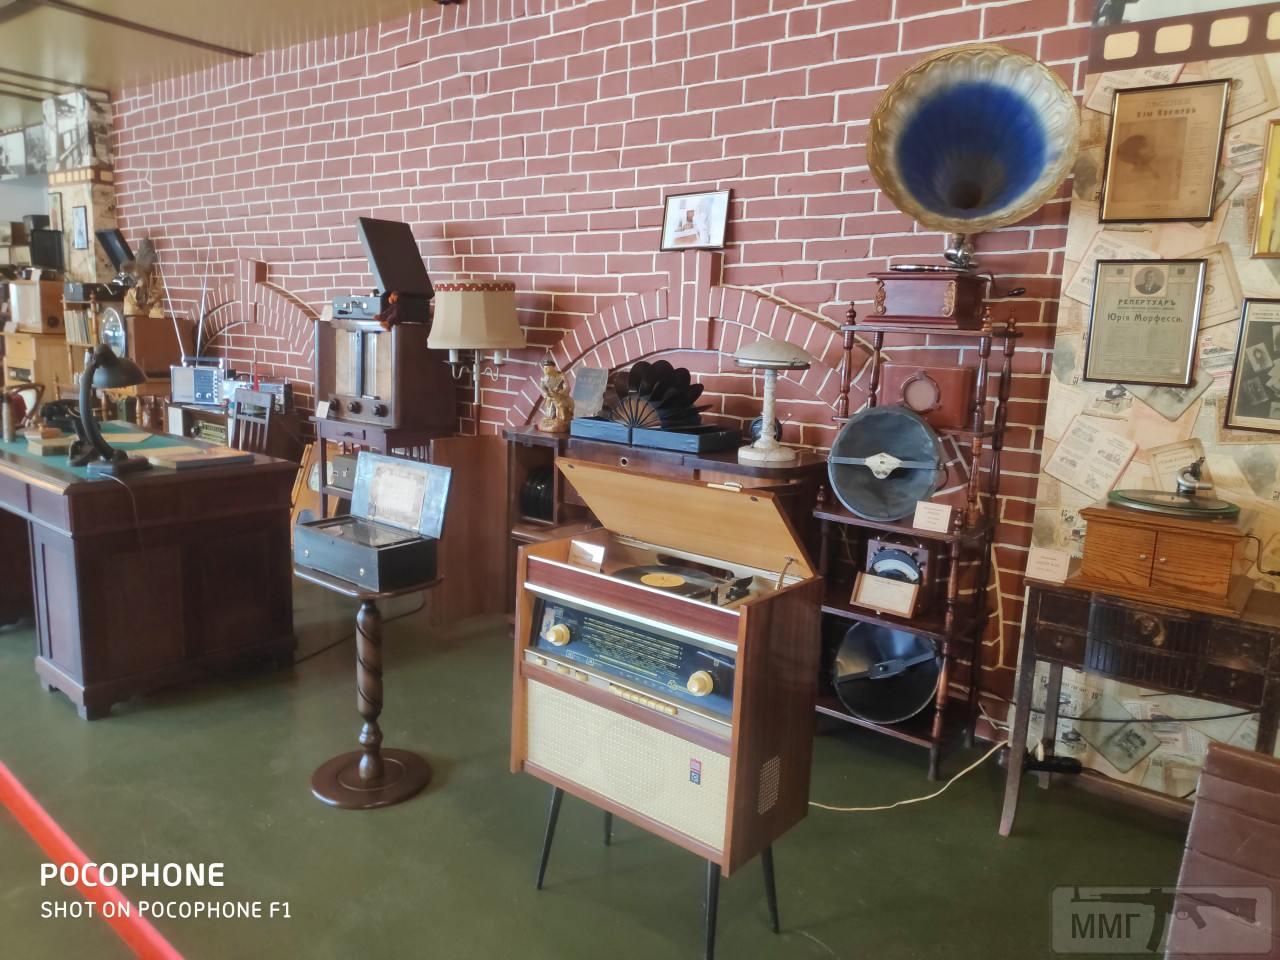 71132 - Музей техники Фаэтон в г. Запорожье